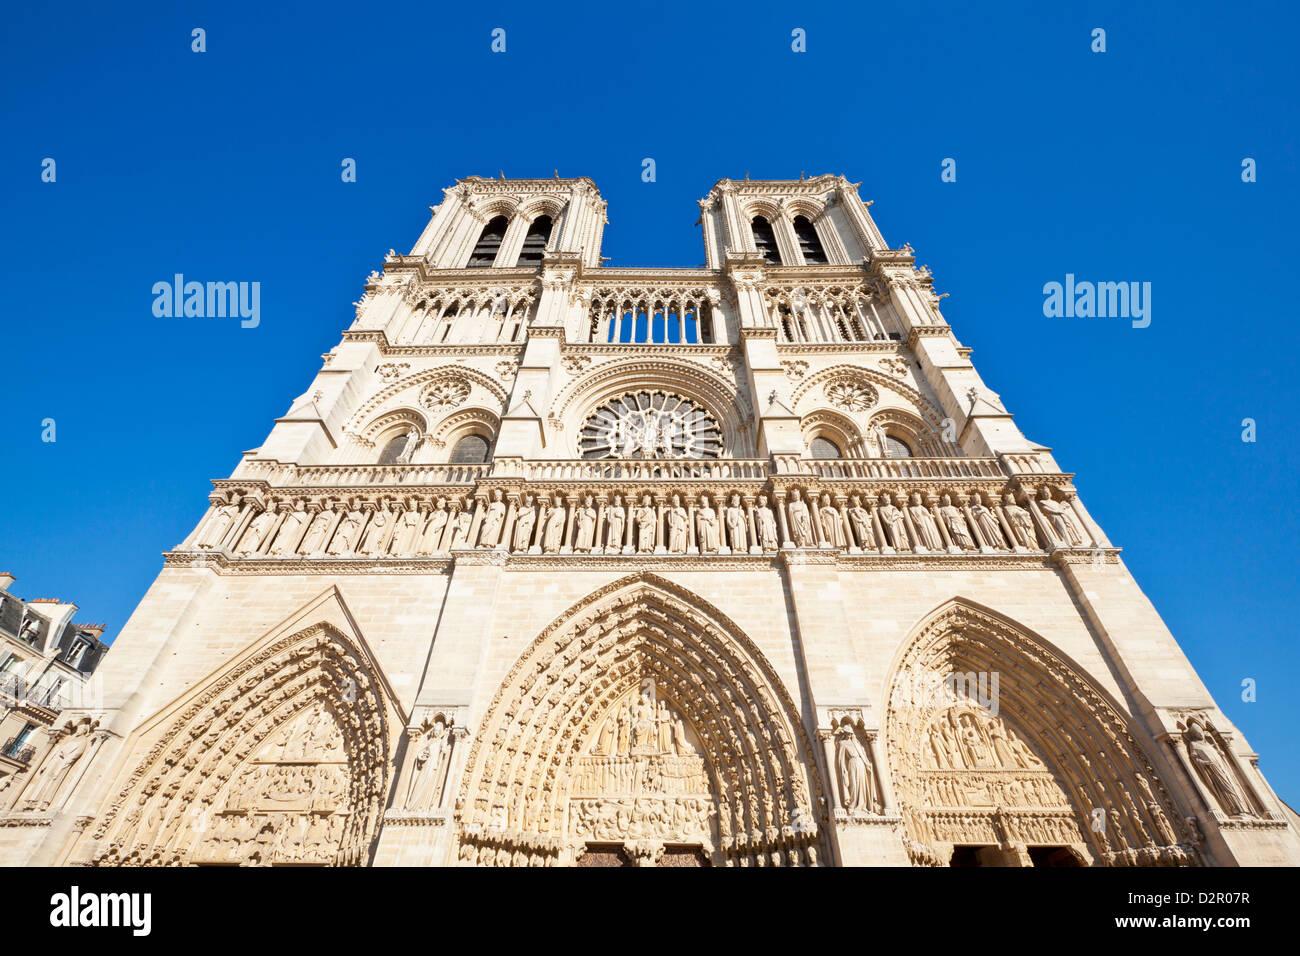 Fachada de la catedral de Notre Dame, Ile de la Cité, París, Francia, Europa Imagen De Stock